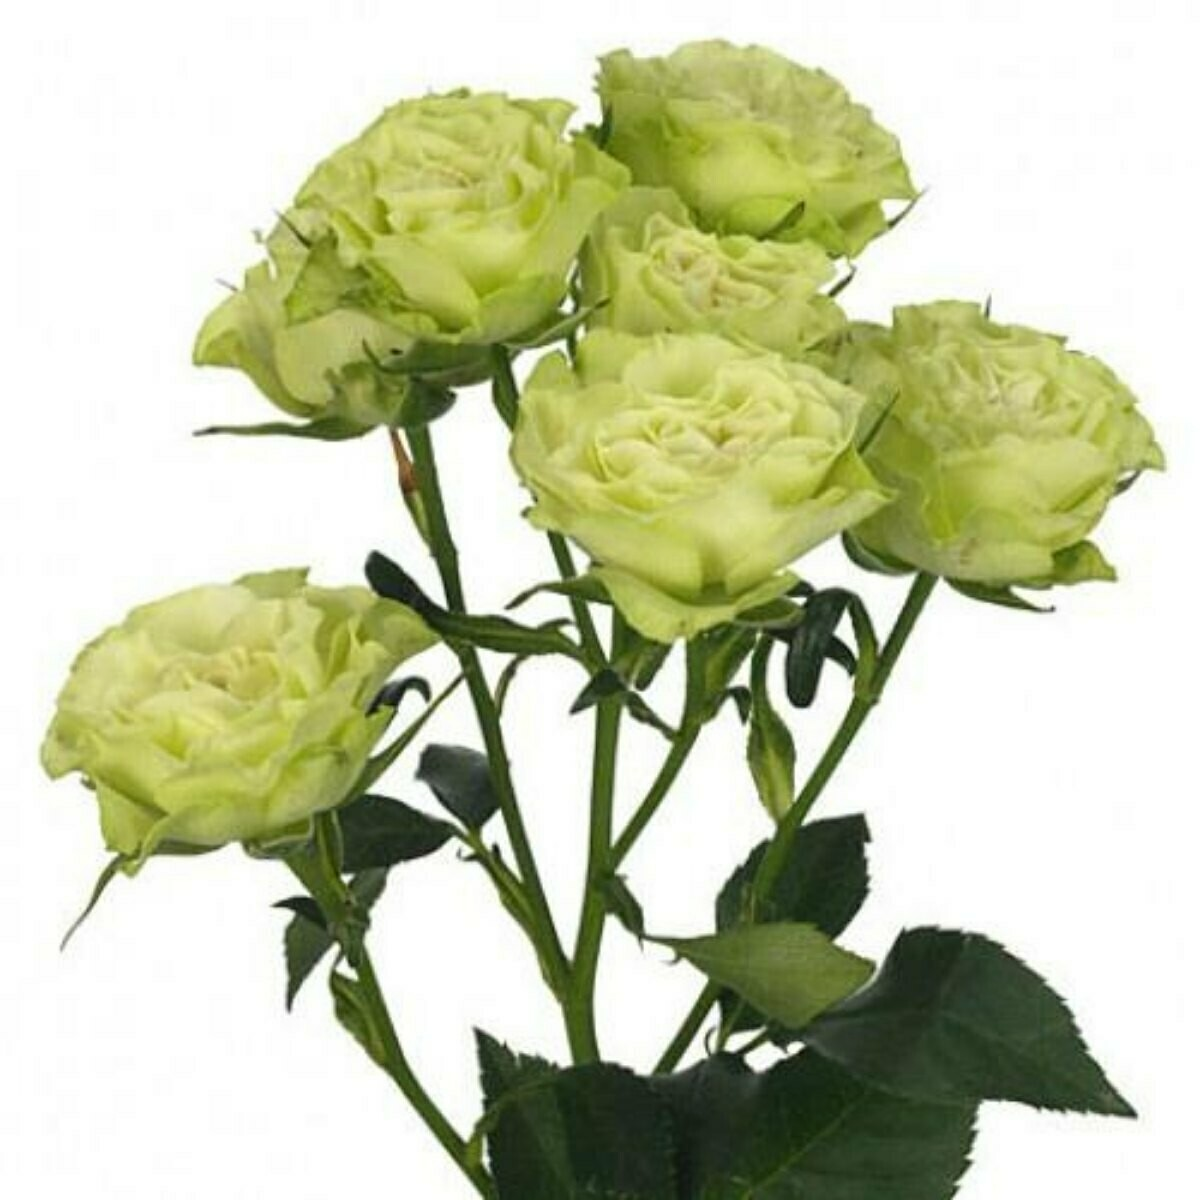 Luviana - Spray Roses white